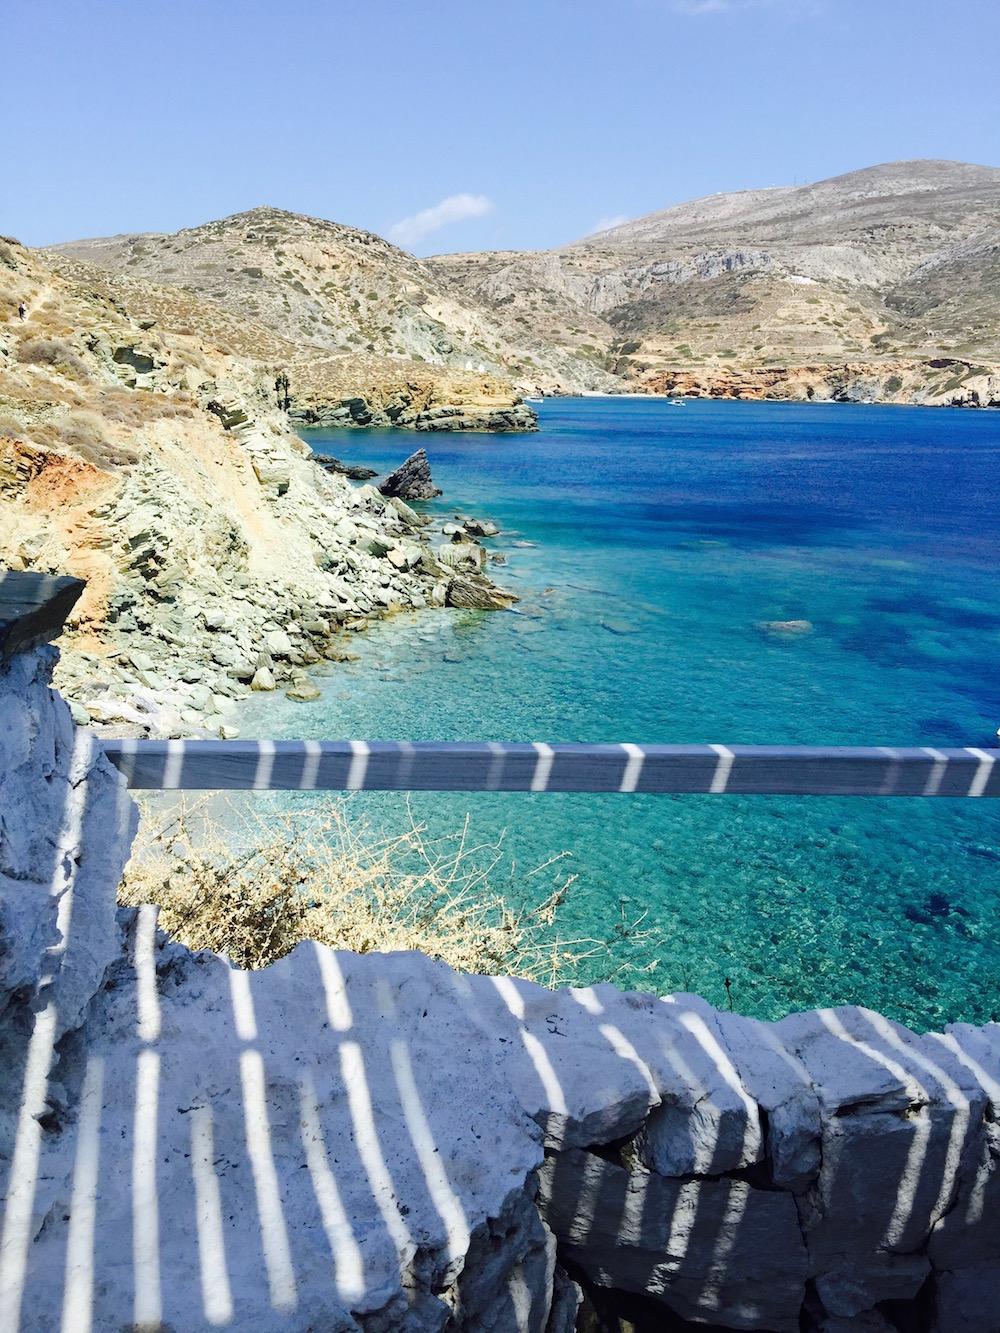 Agios Nikolaos, Folegandros, Cyclades